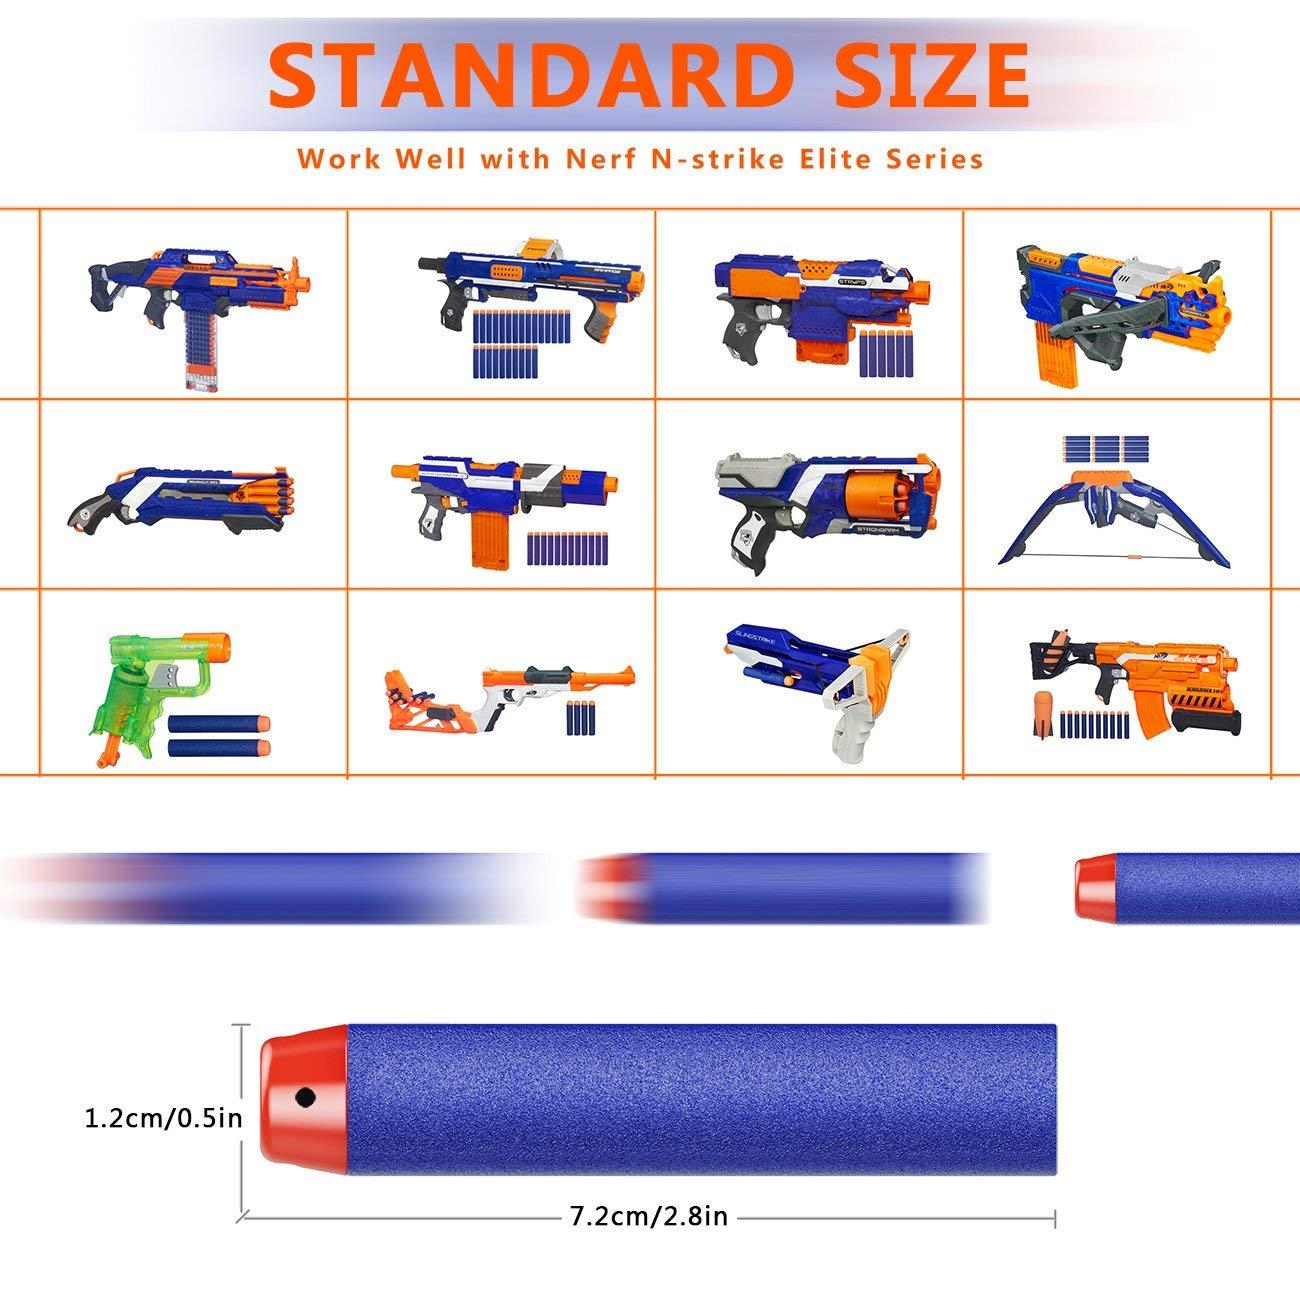 Darts for Kids Toy Gun